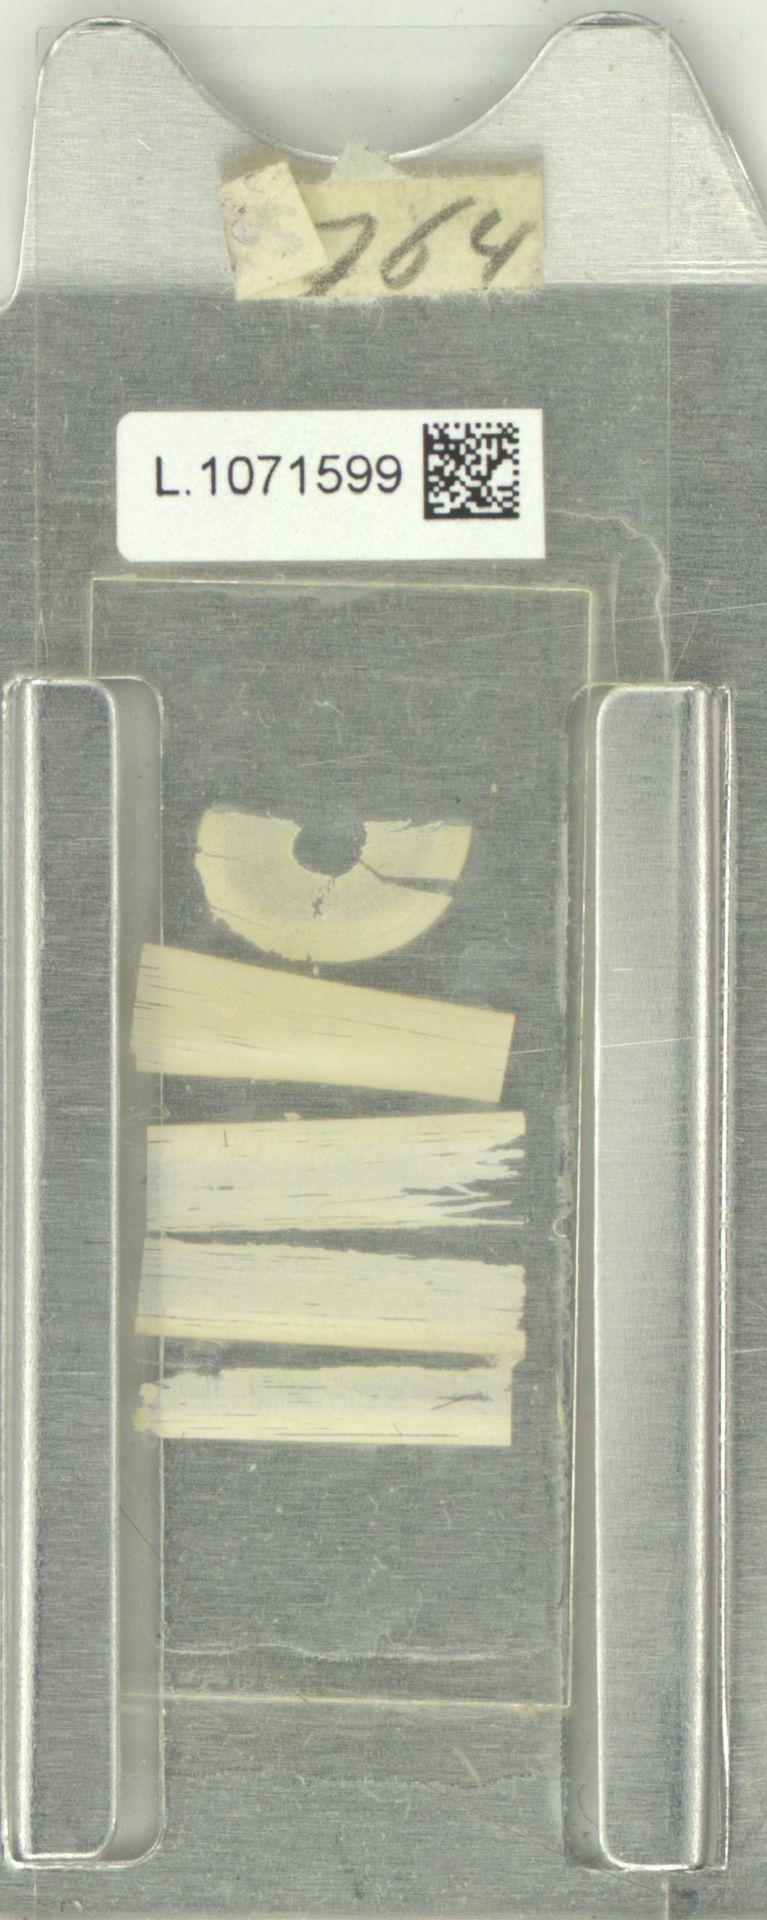 L.1071599 | Broussonetia kazinoki Siebold